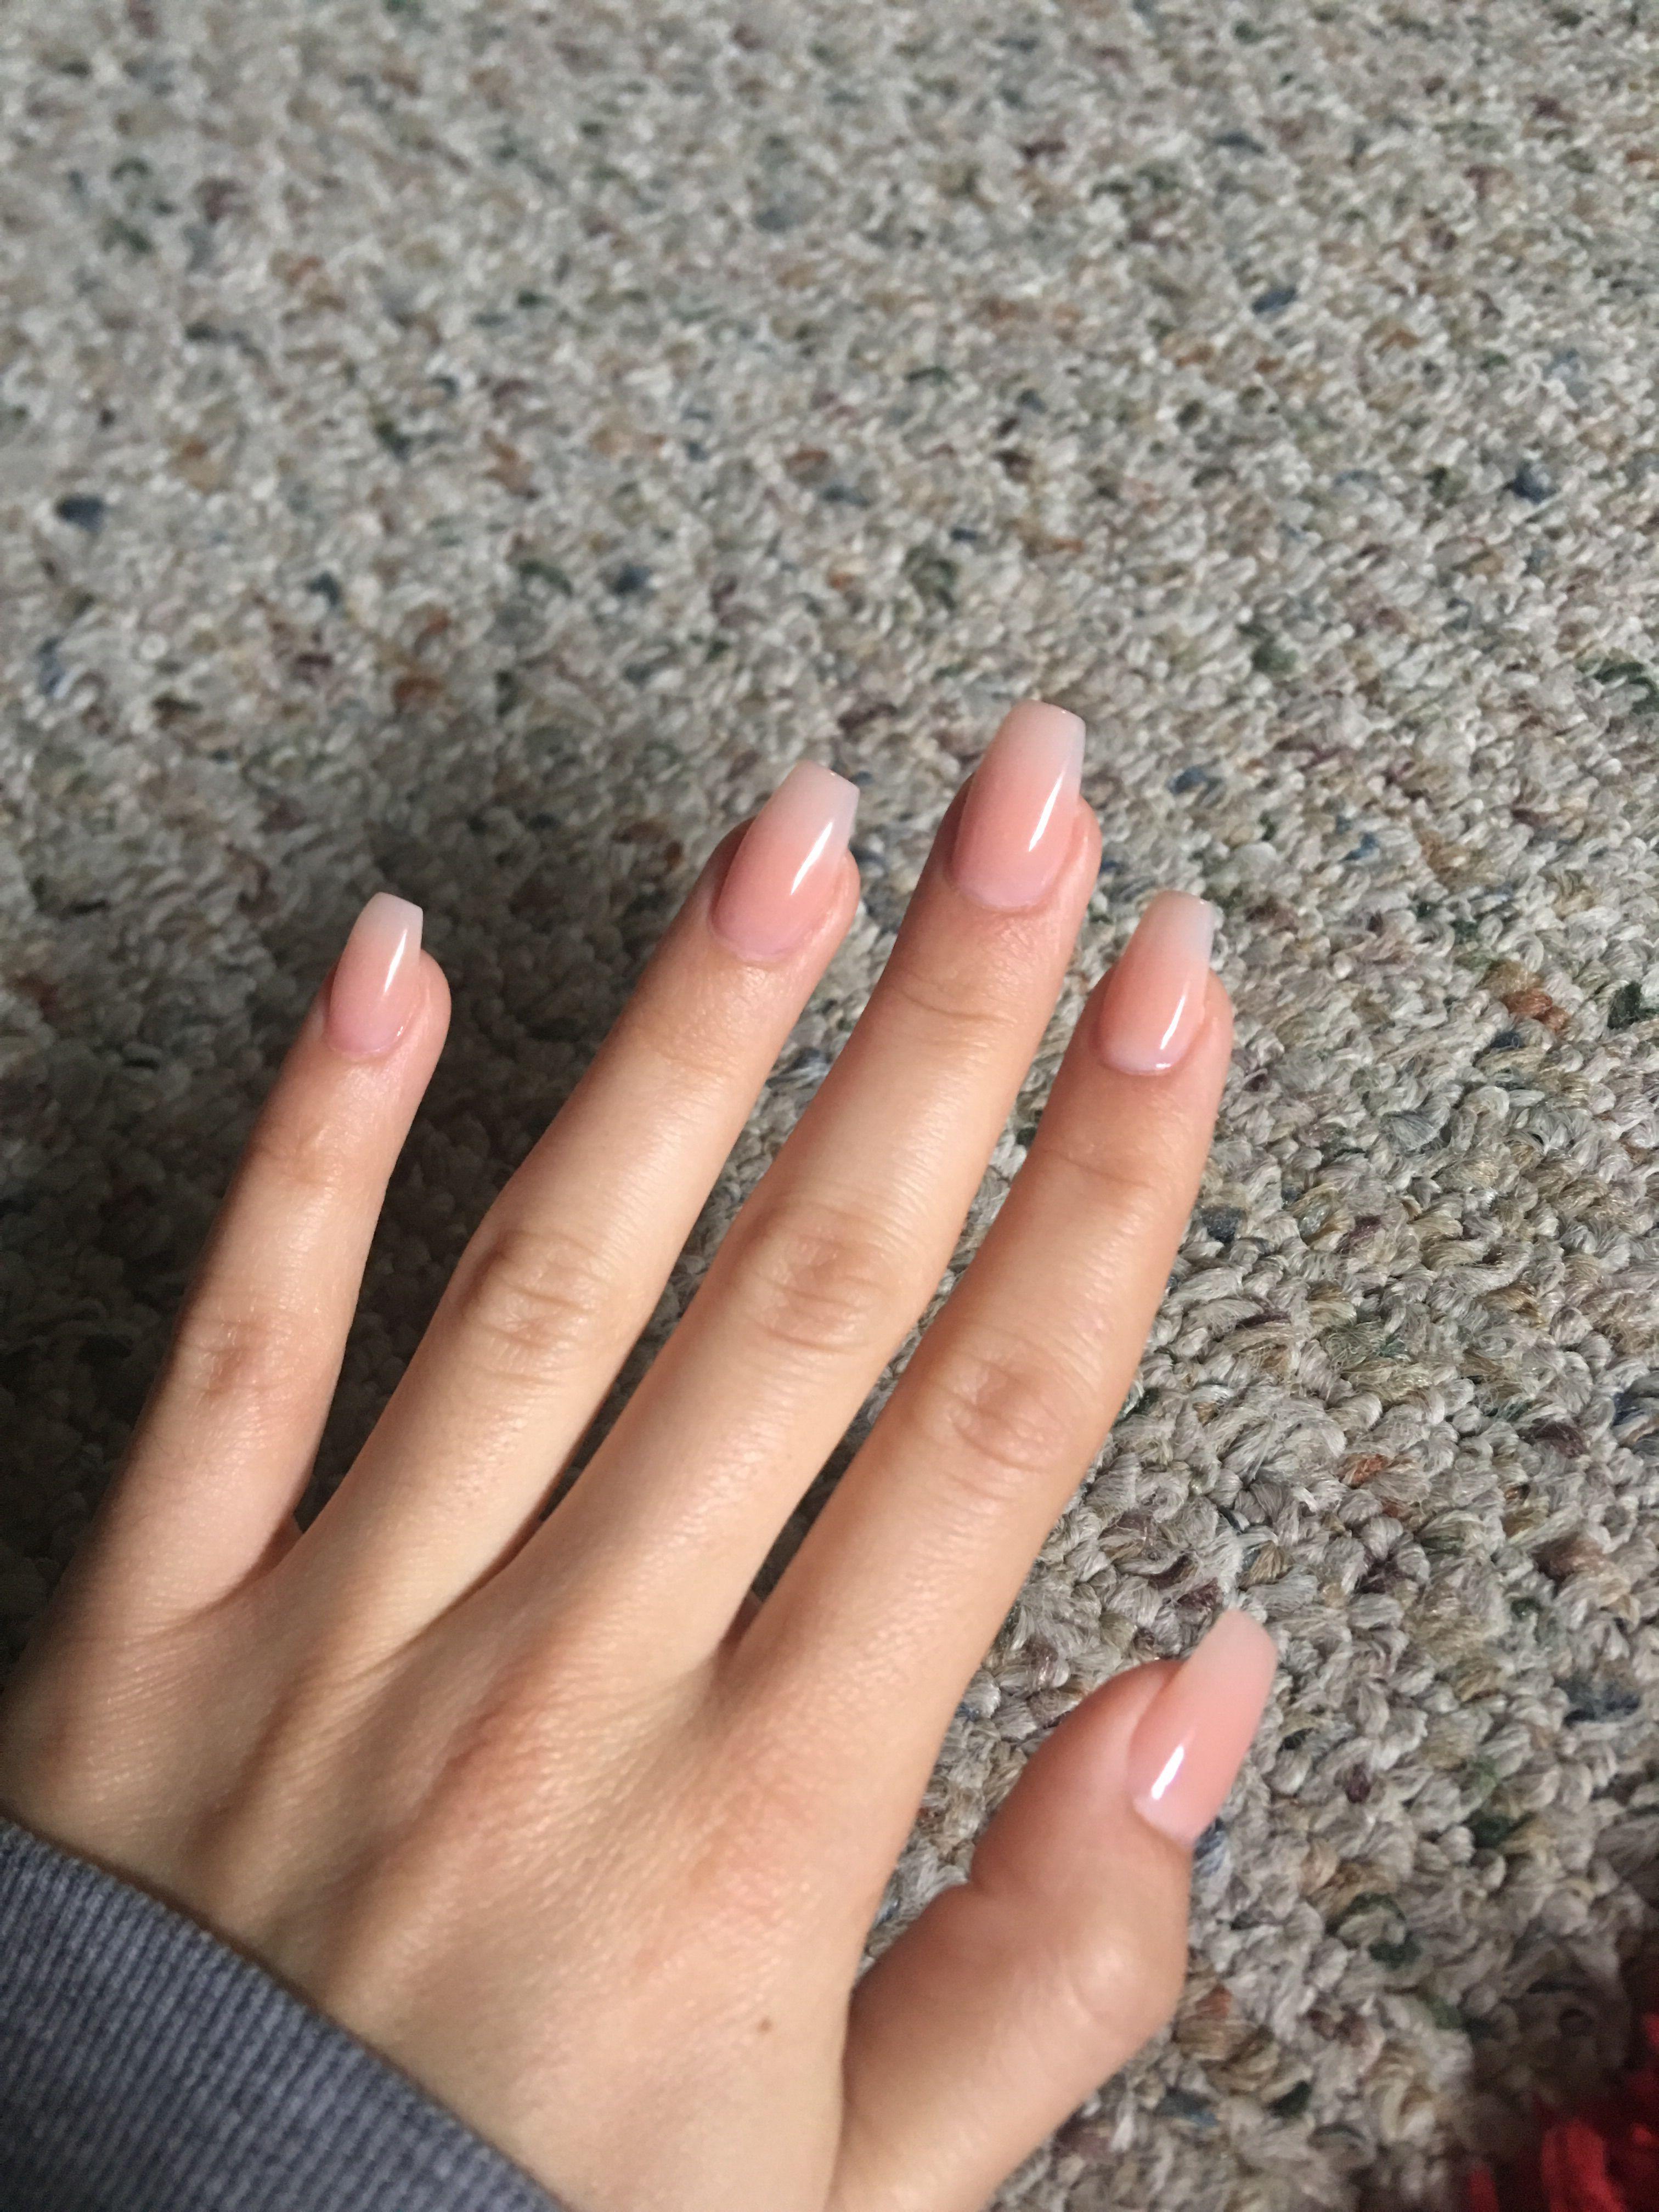 Tips Dip In Natural Nails Beauty Strong Natural Natural Acrylic Nails Pink Nails Dipped Nails